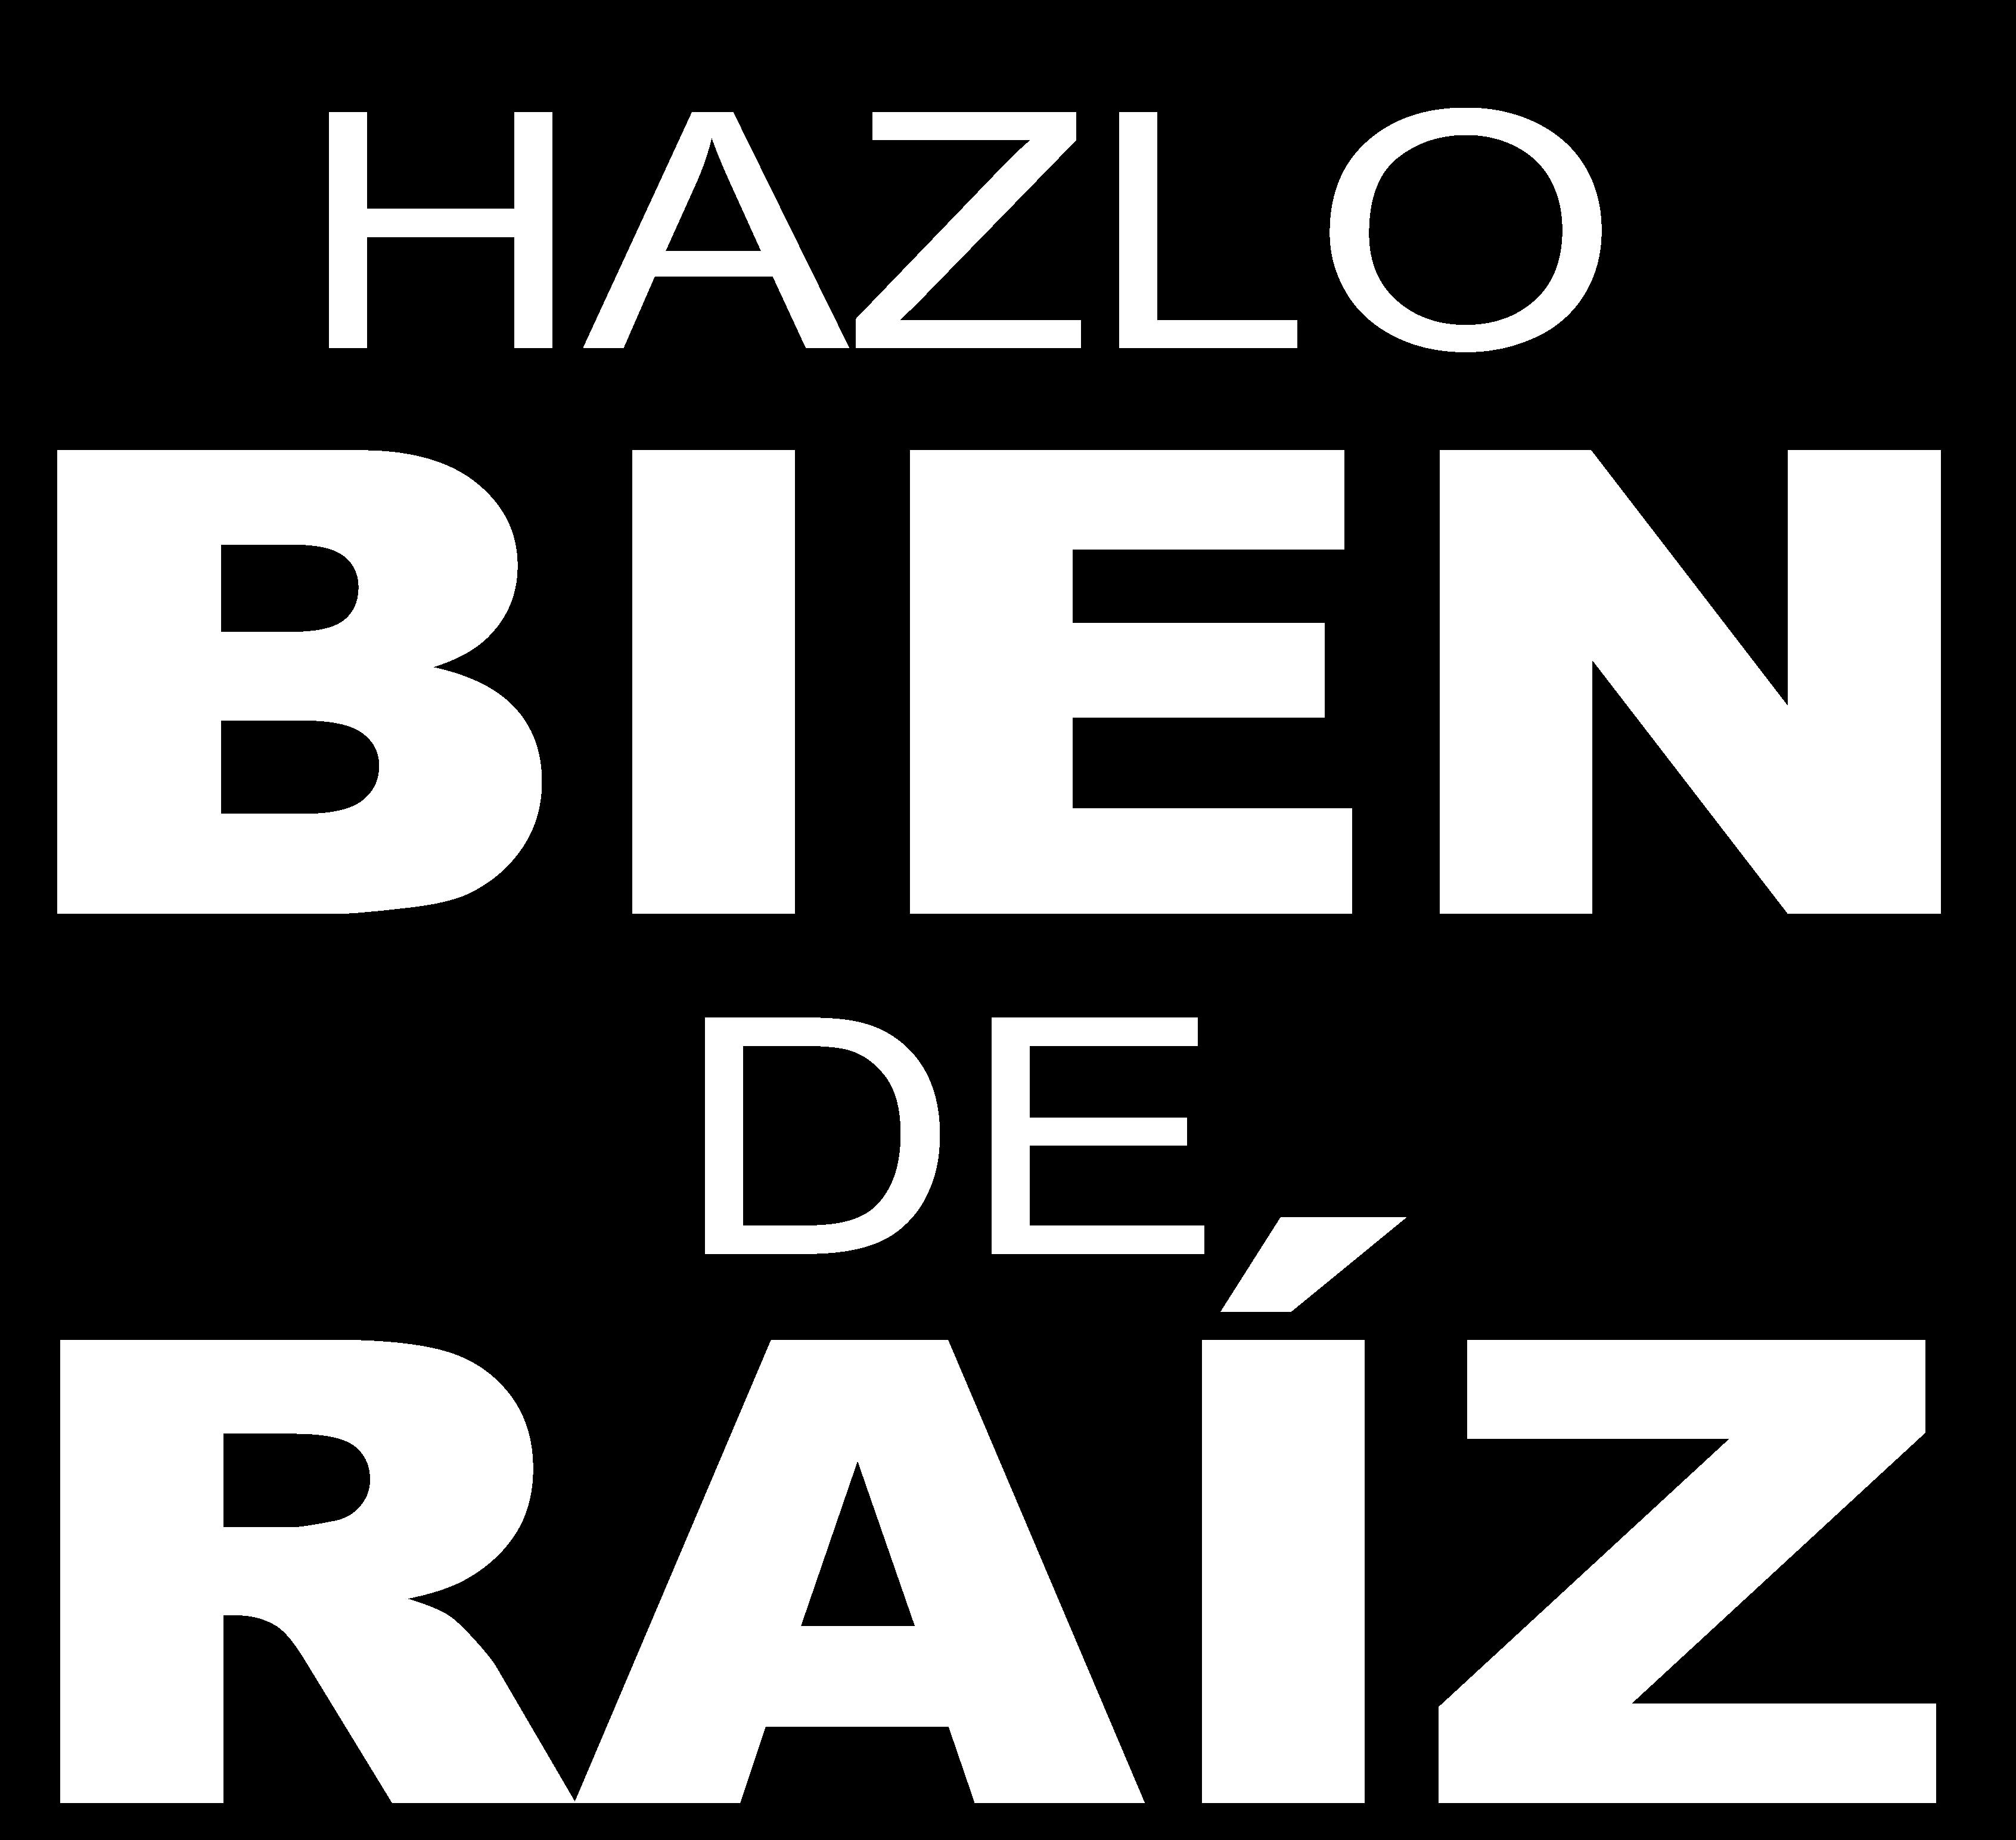 hazlo-png.png